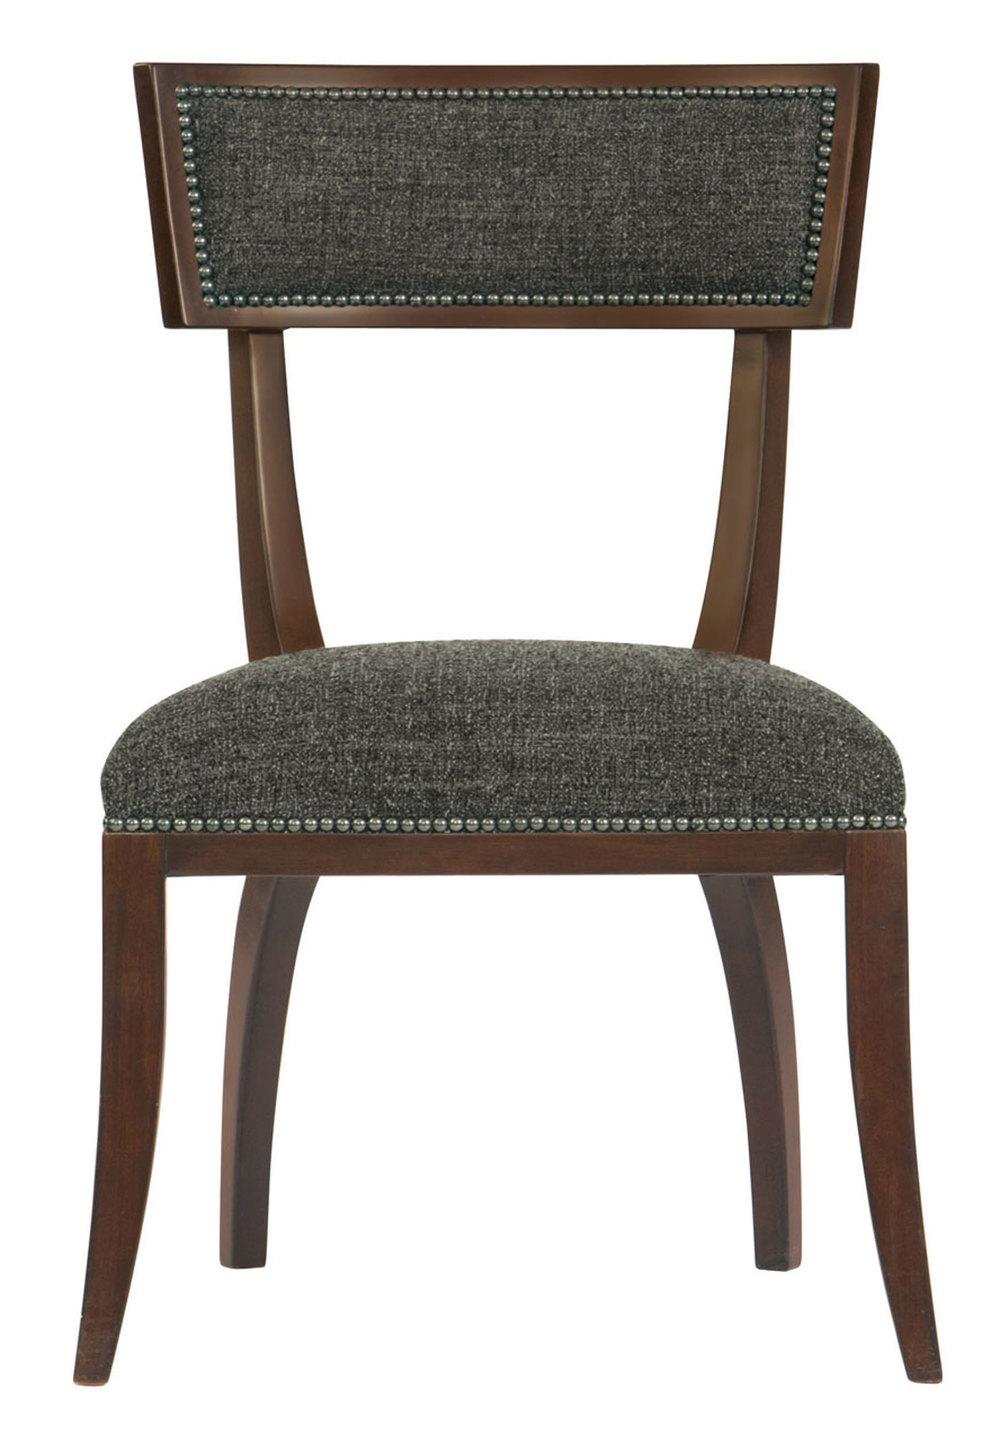 Bernhardt - Dining Side Chair